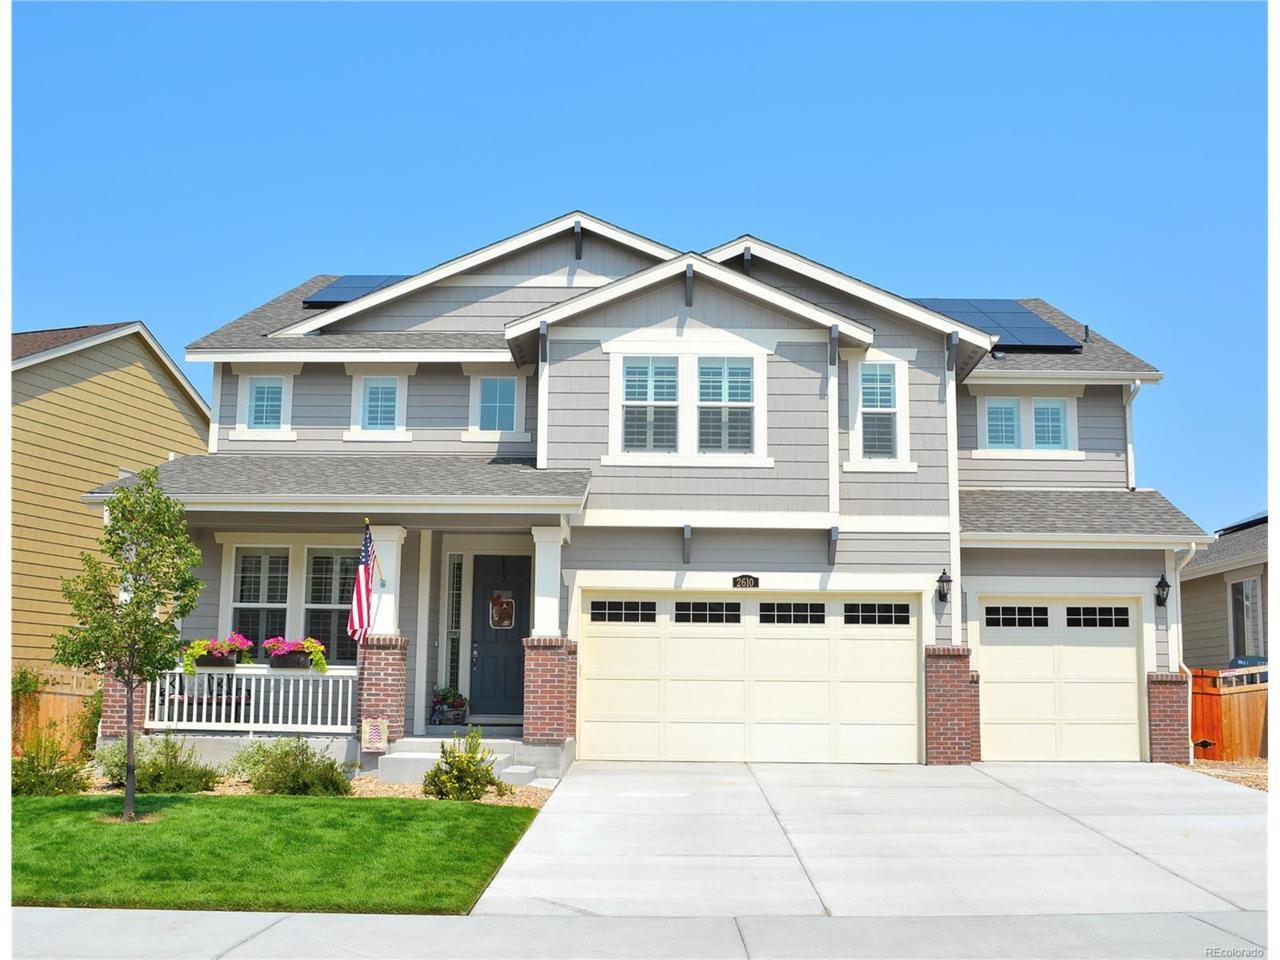 2610 Leafdale Circle, Castle Rock, CO 80109 (MLS #4031566) :: 8z Real Estate